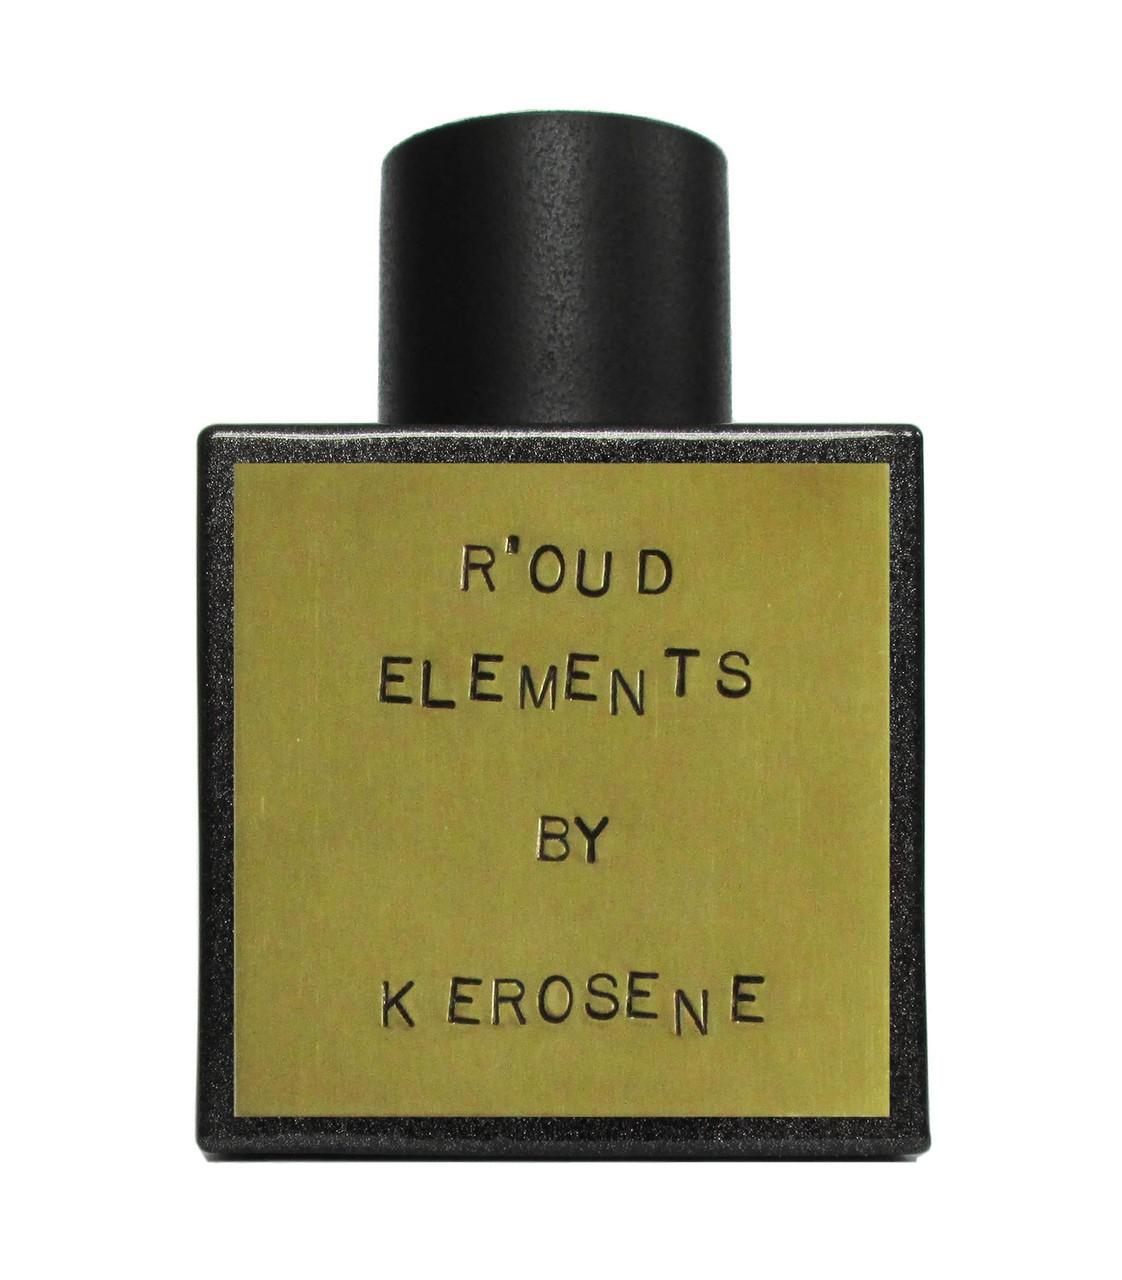 kerosene r'oud elements